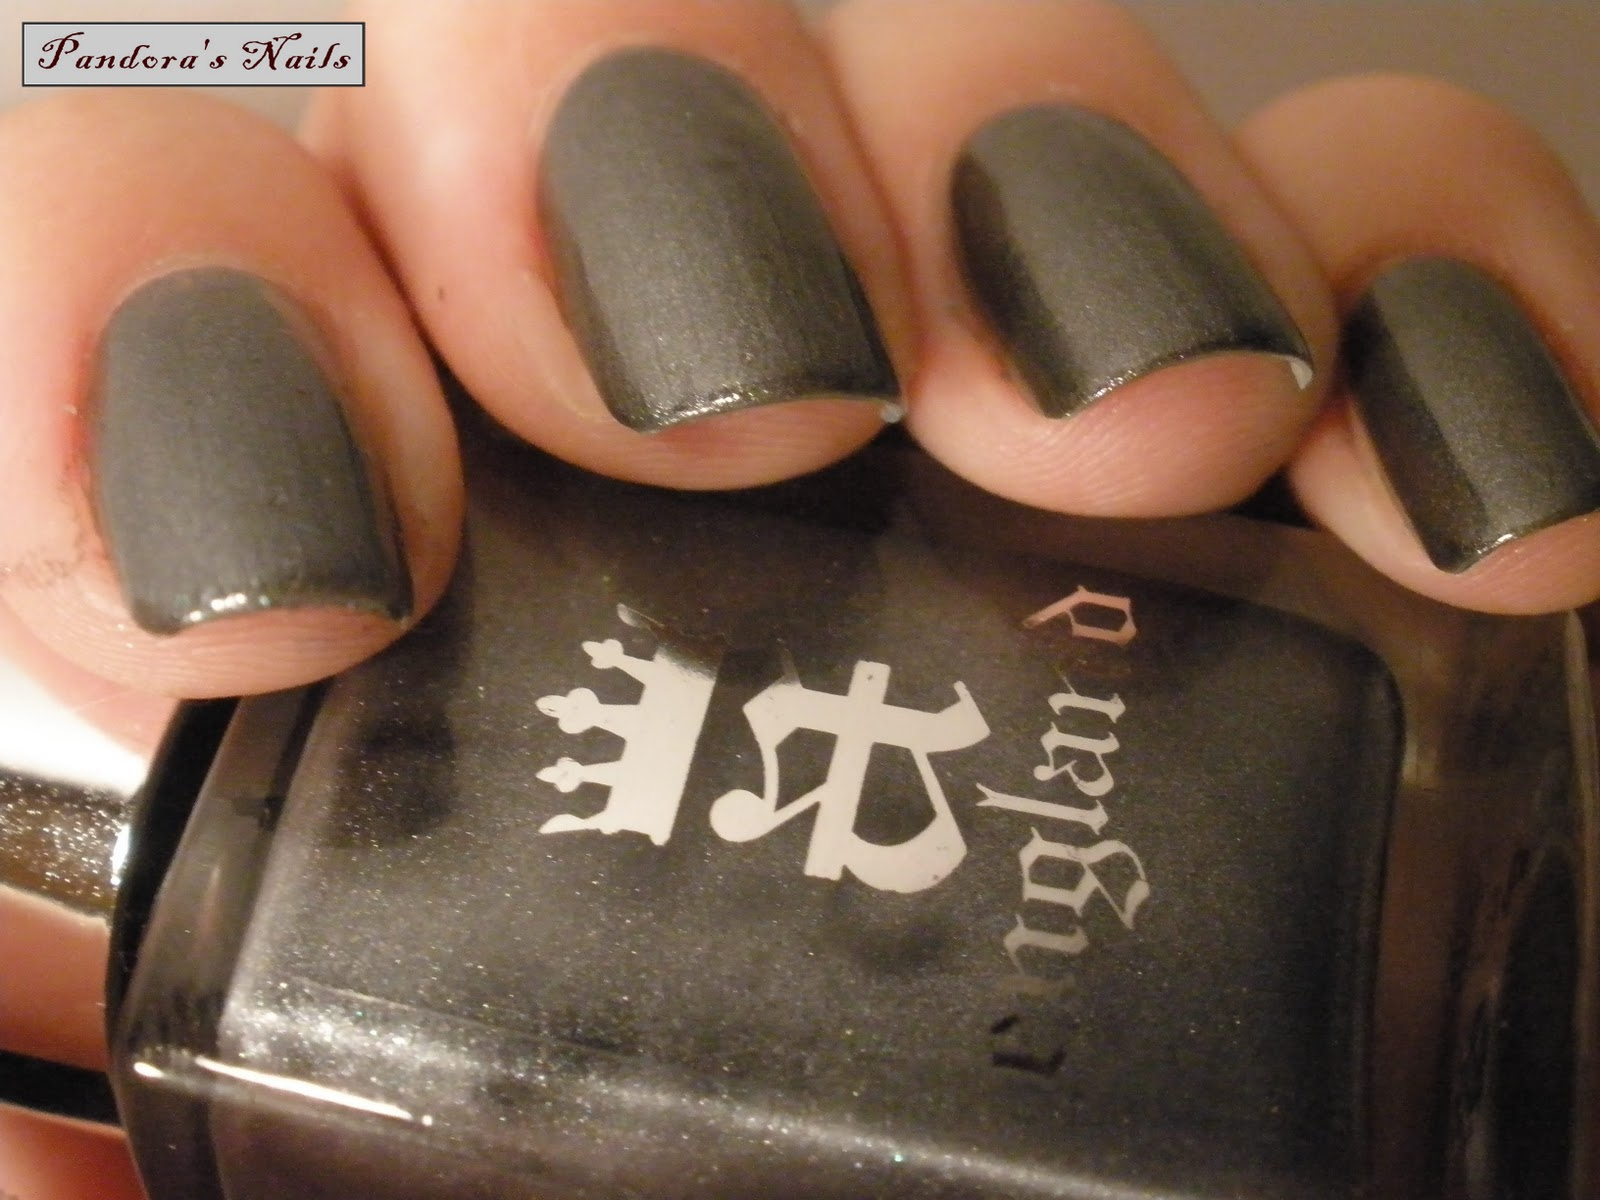 Pandora\'s Nails: a-england King Arthur and Nails Inc Sloane Square